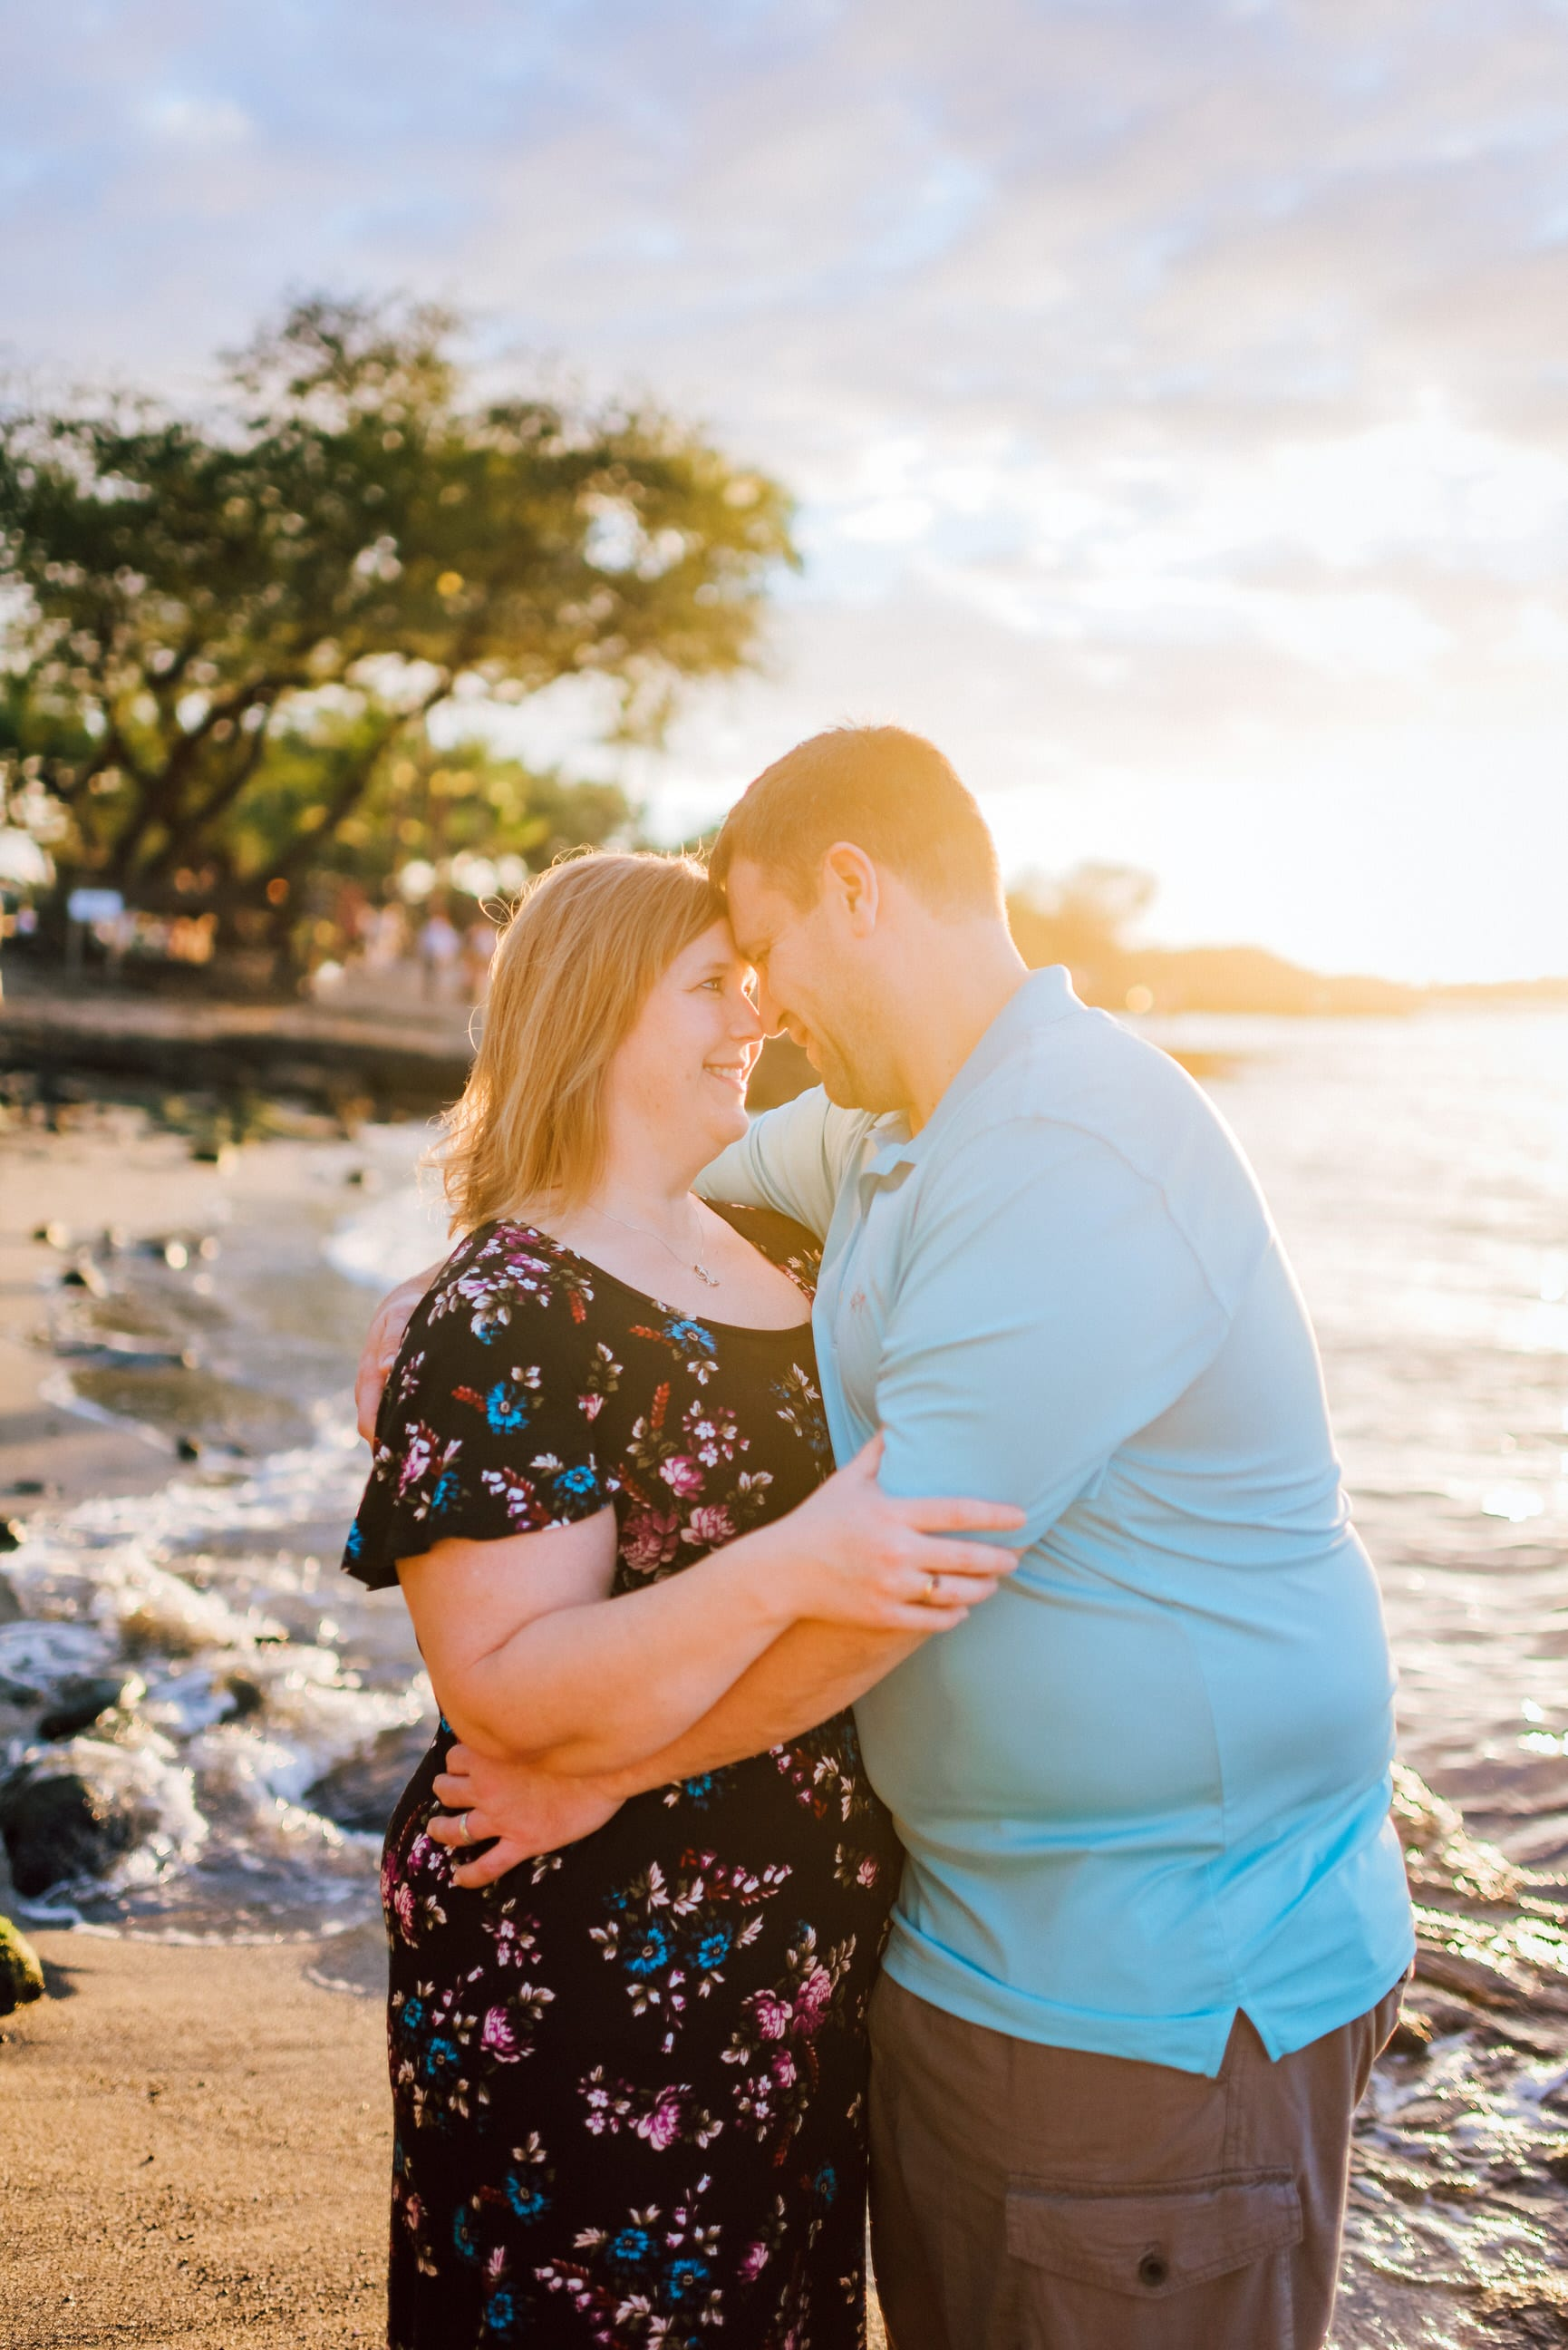 Big-Island-Photographers-Waikoloa-Family-Photos9.jpg